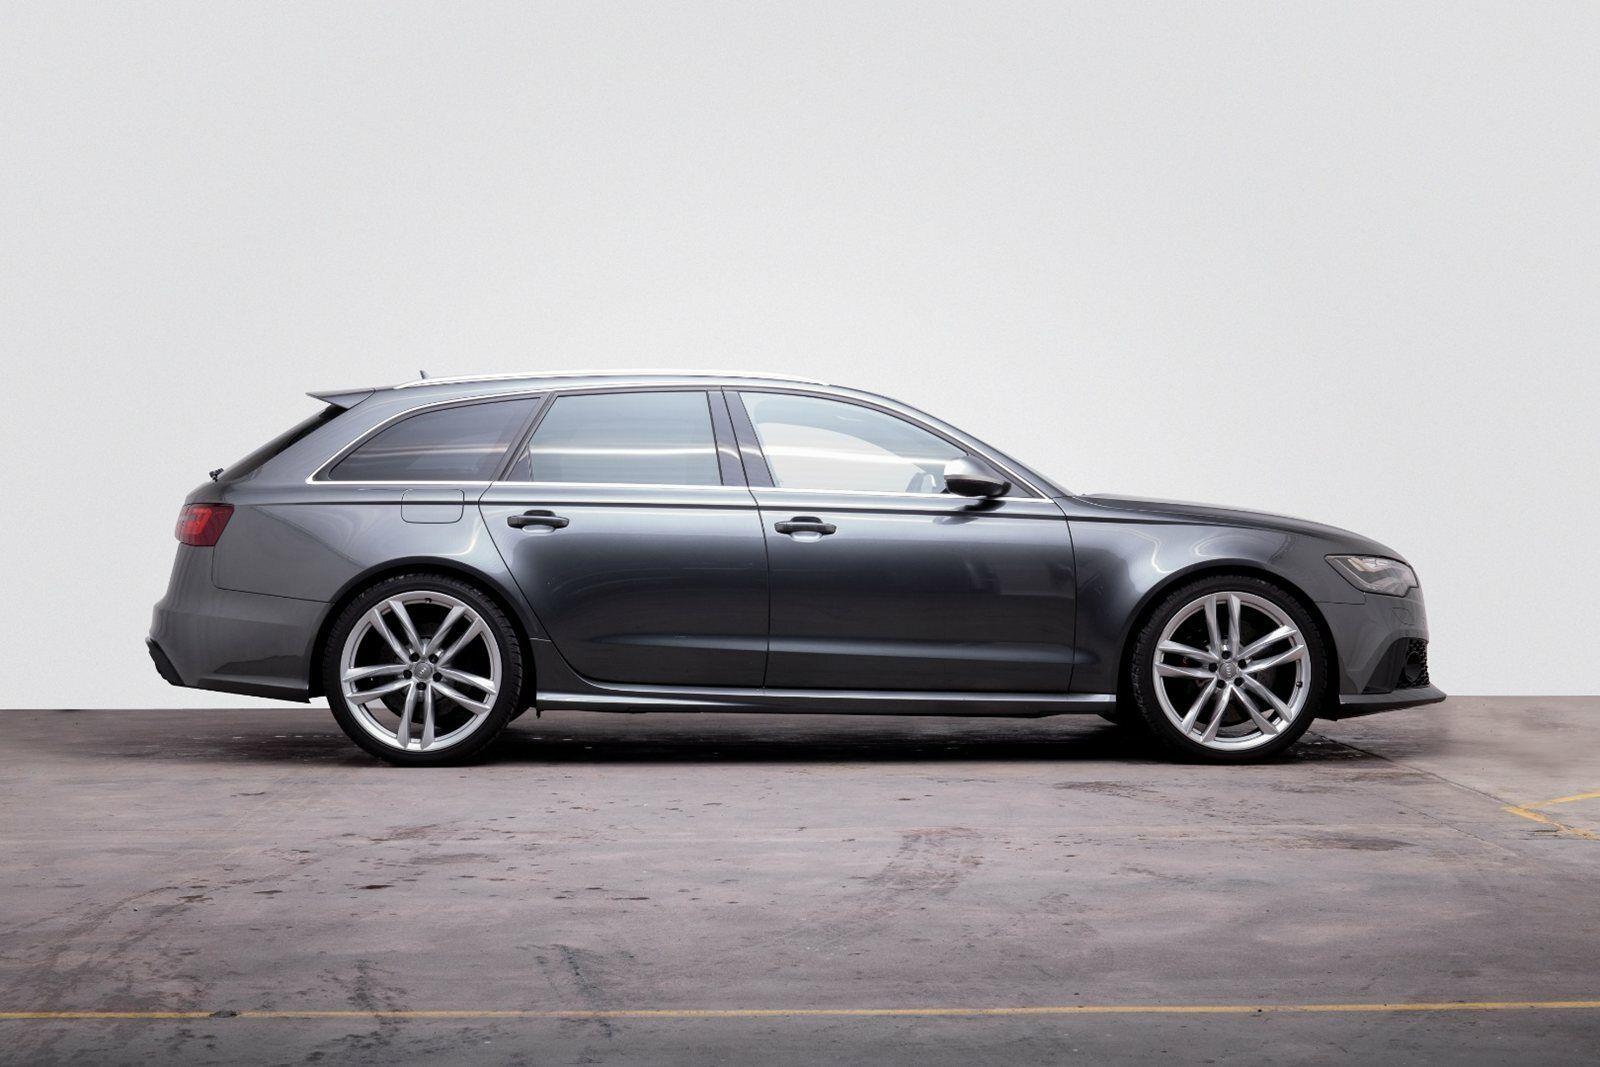 Audi RS6 4,0 TFSi Avant quattro Tiptr. 5d - 4.995 kr.